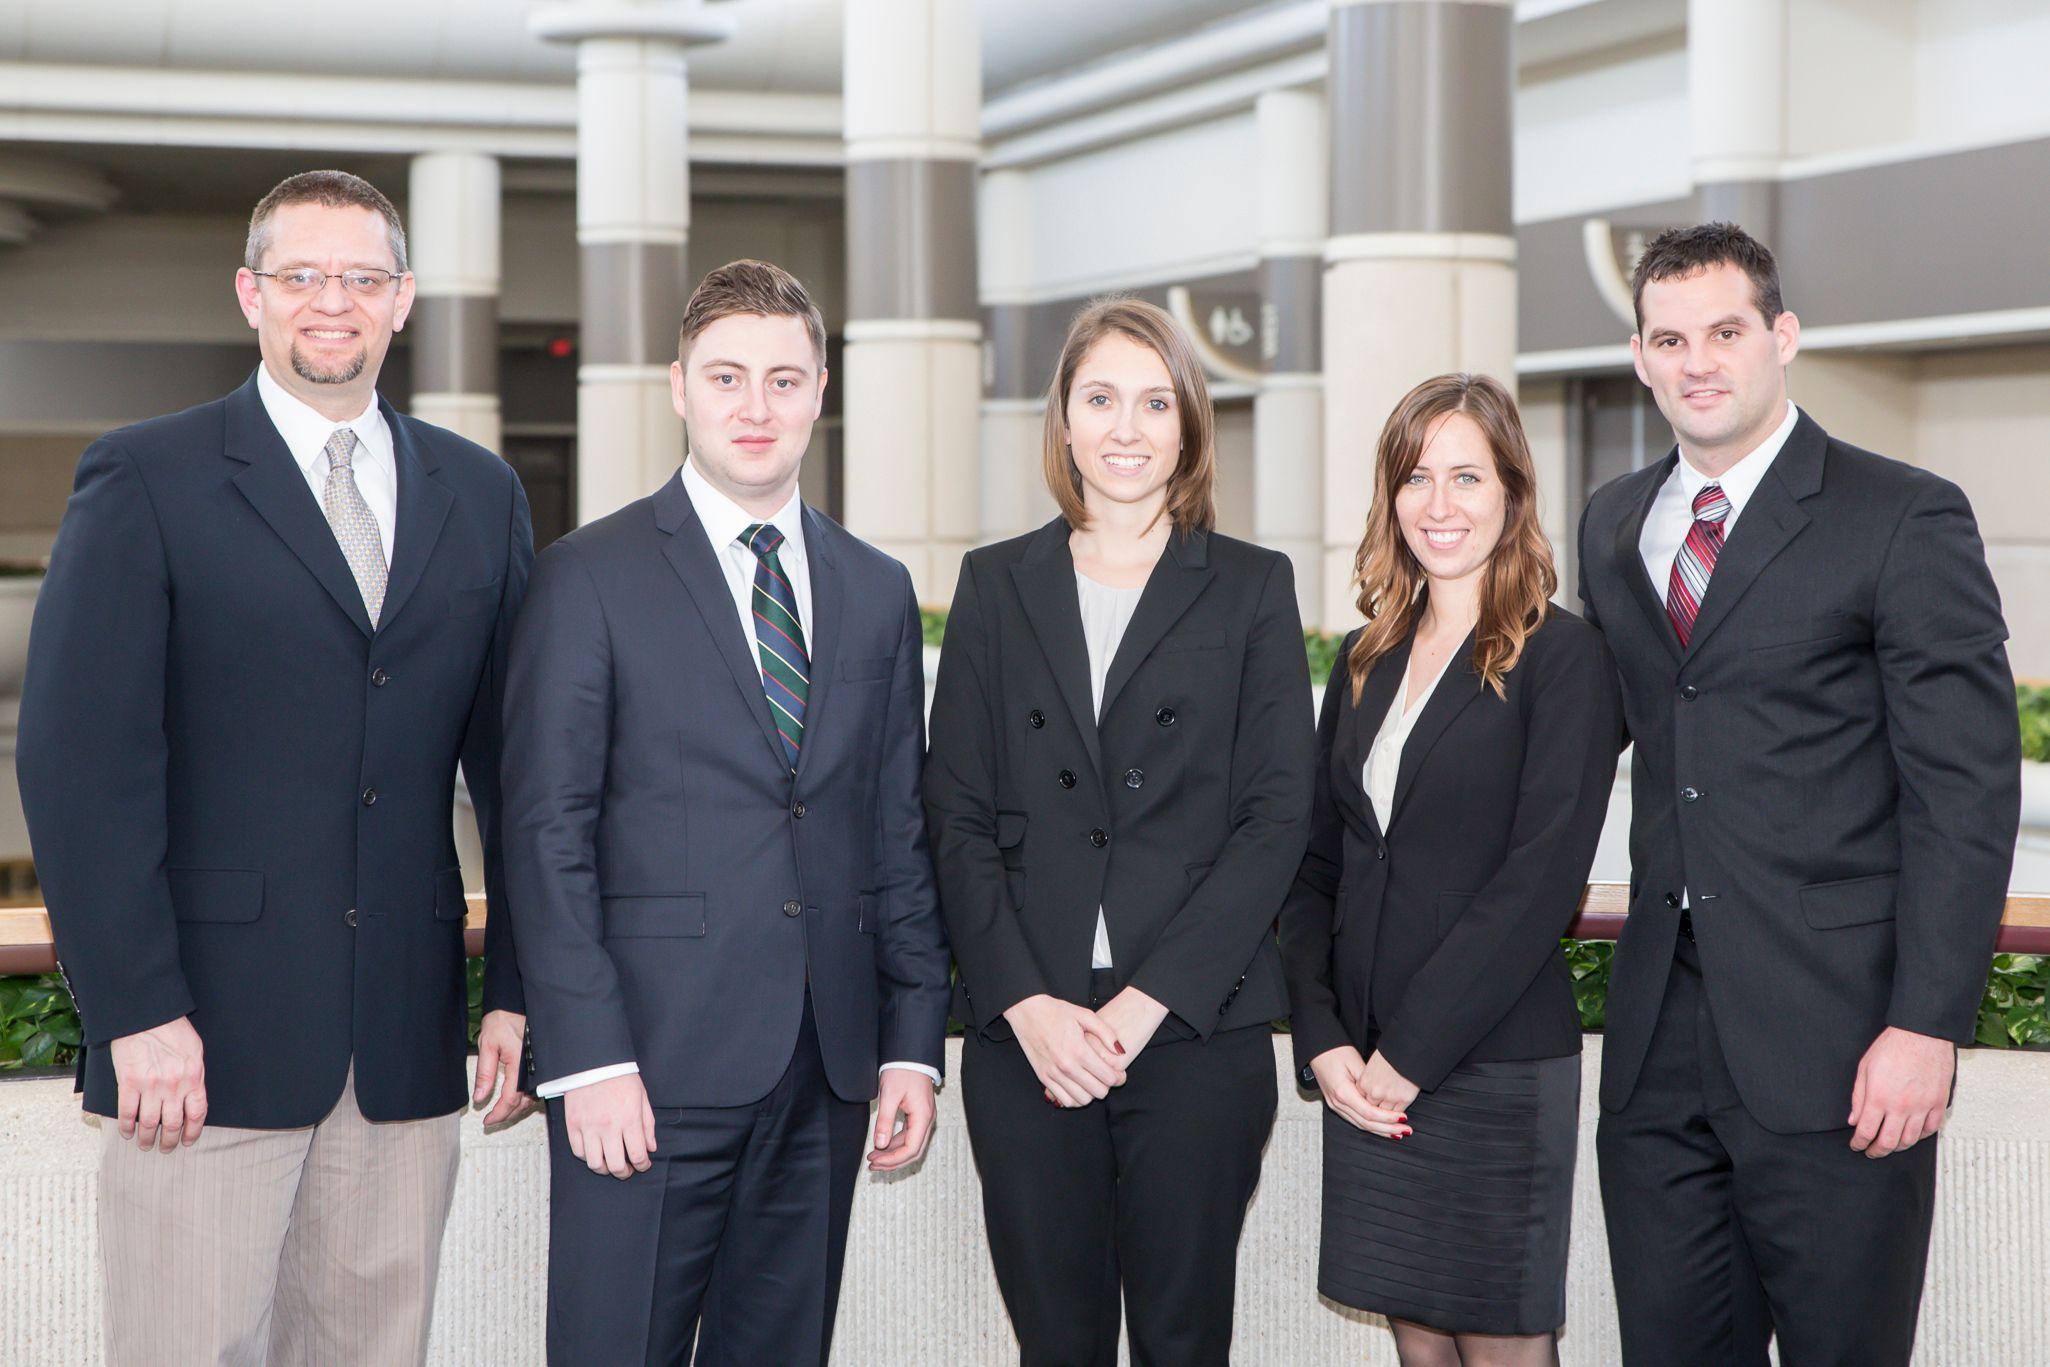 Temple University team and adviser: Robert Aubrey Kent, Simon Brandon-Lai, Britney Talty, Nicole Schafer & Gareth Jones